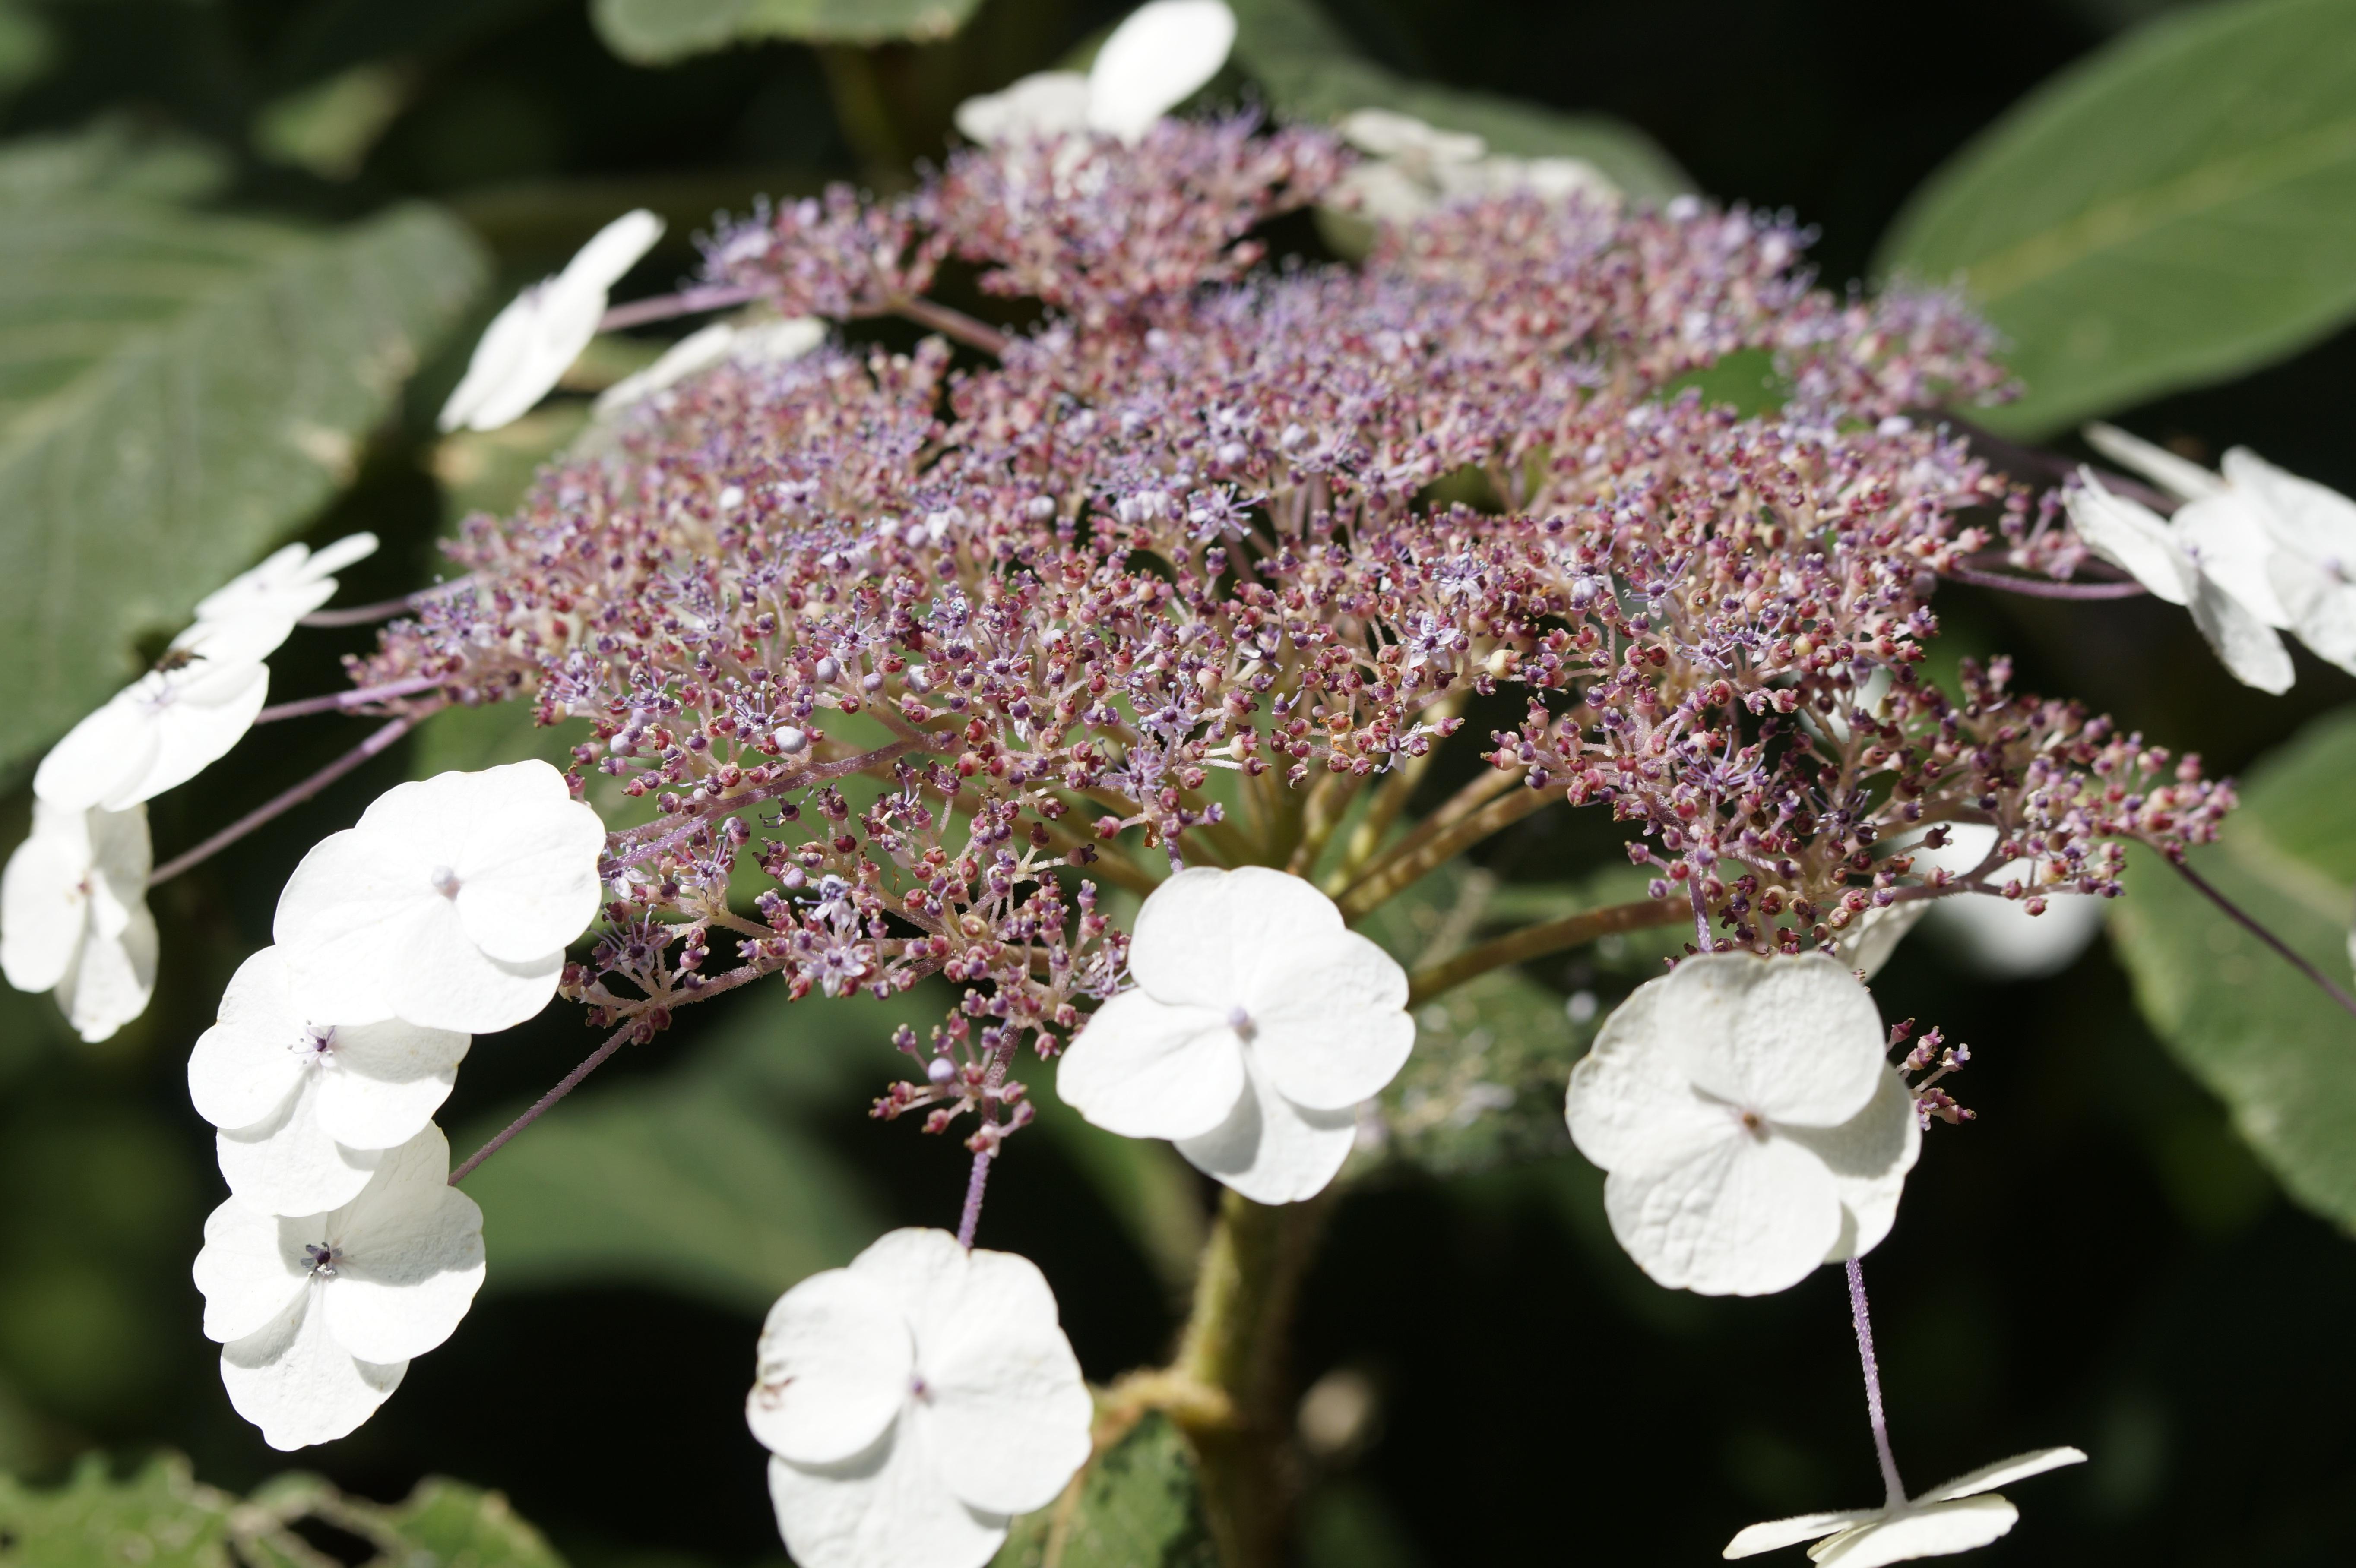 Amazing White Flowers In A Botanic Garden Free Image